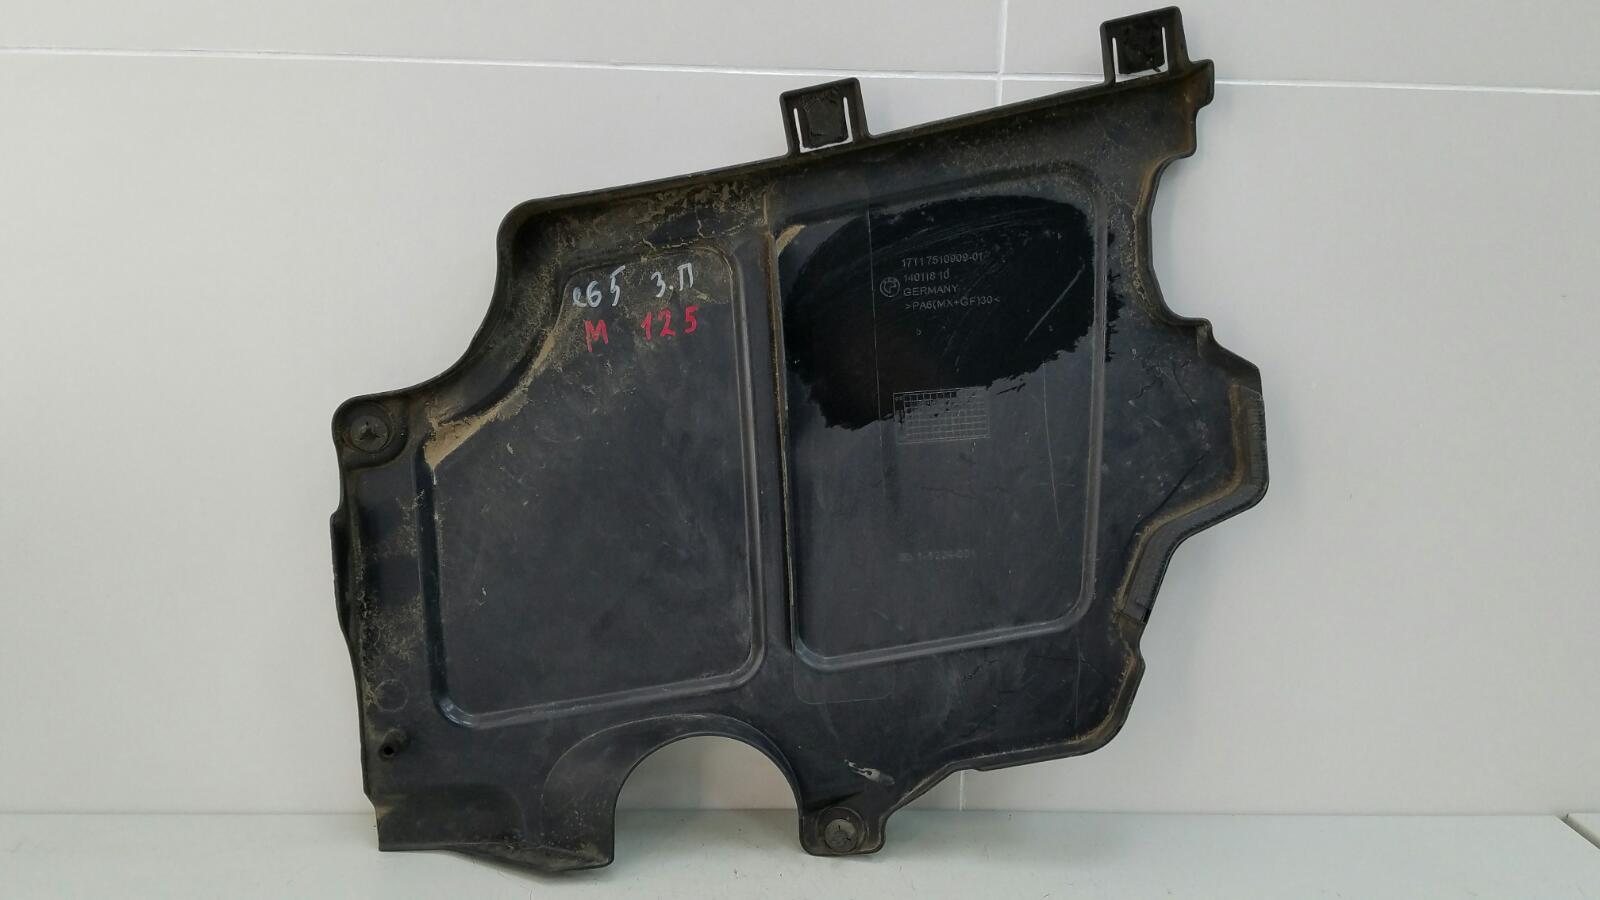 Защита днища антигравийная Bmw 745 I Li E65 N62 2001 задняя правая